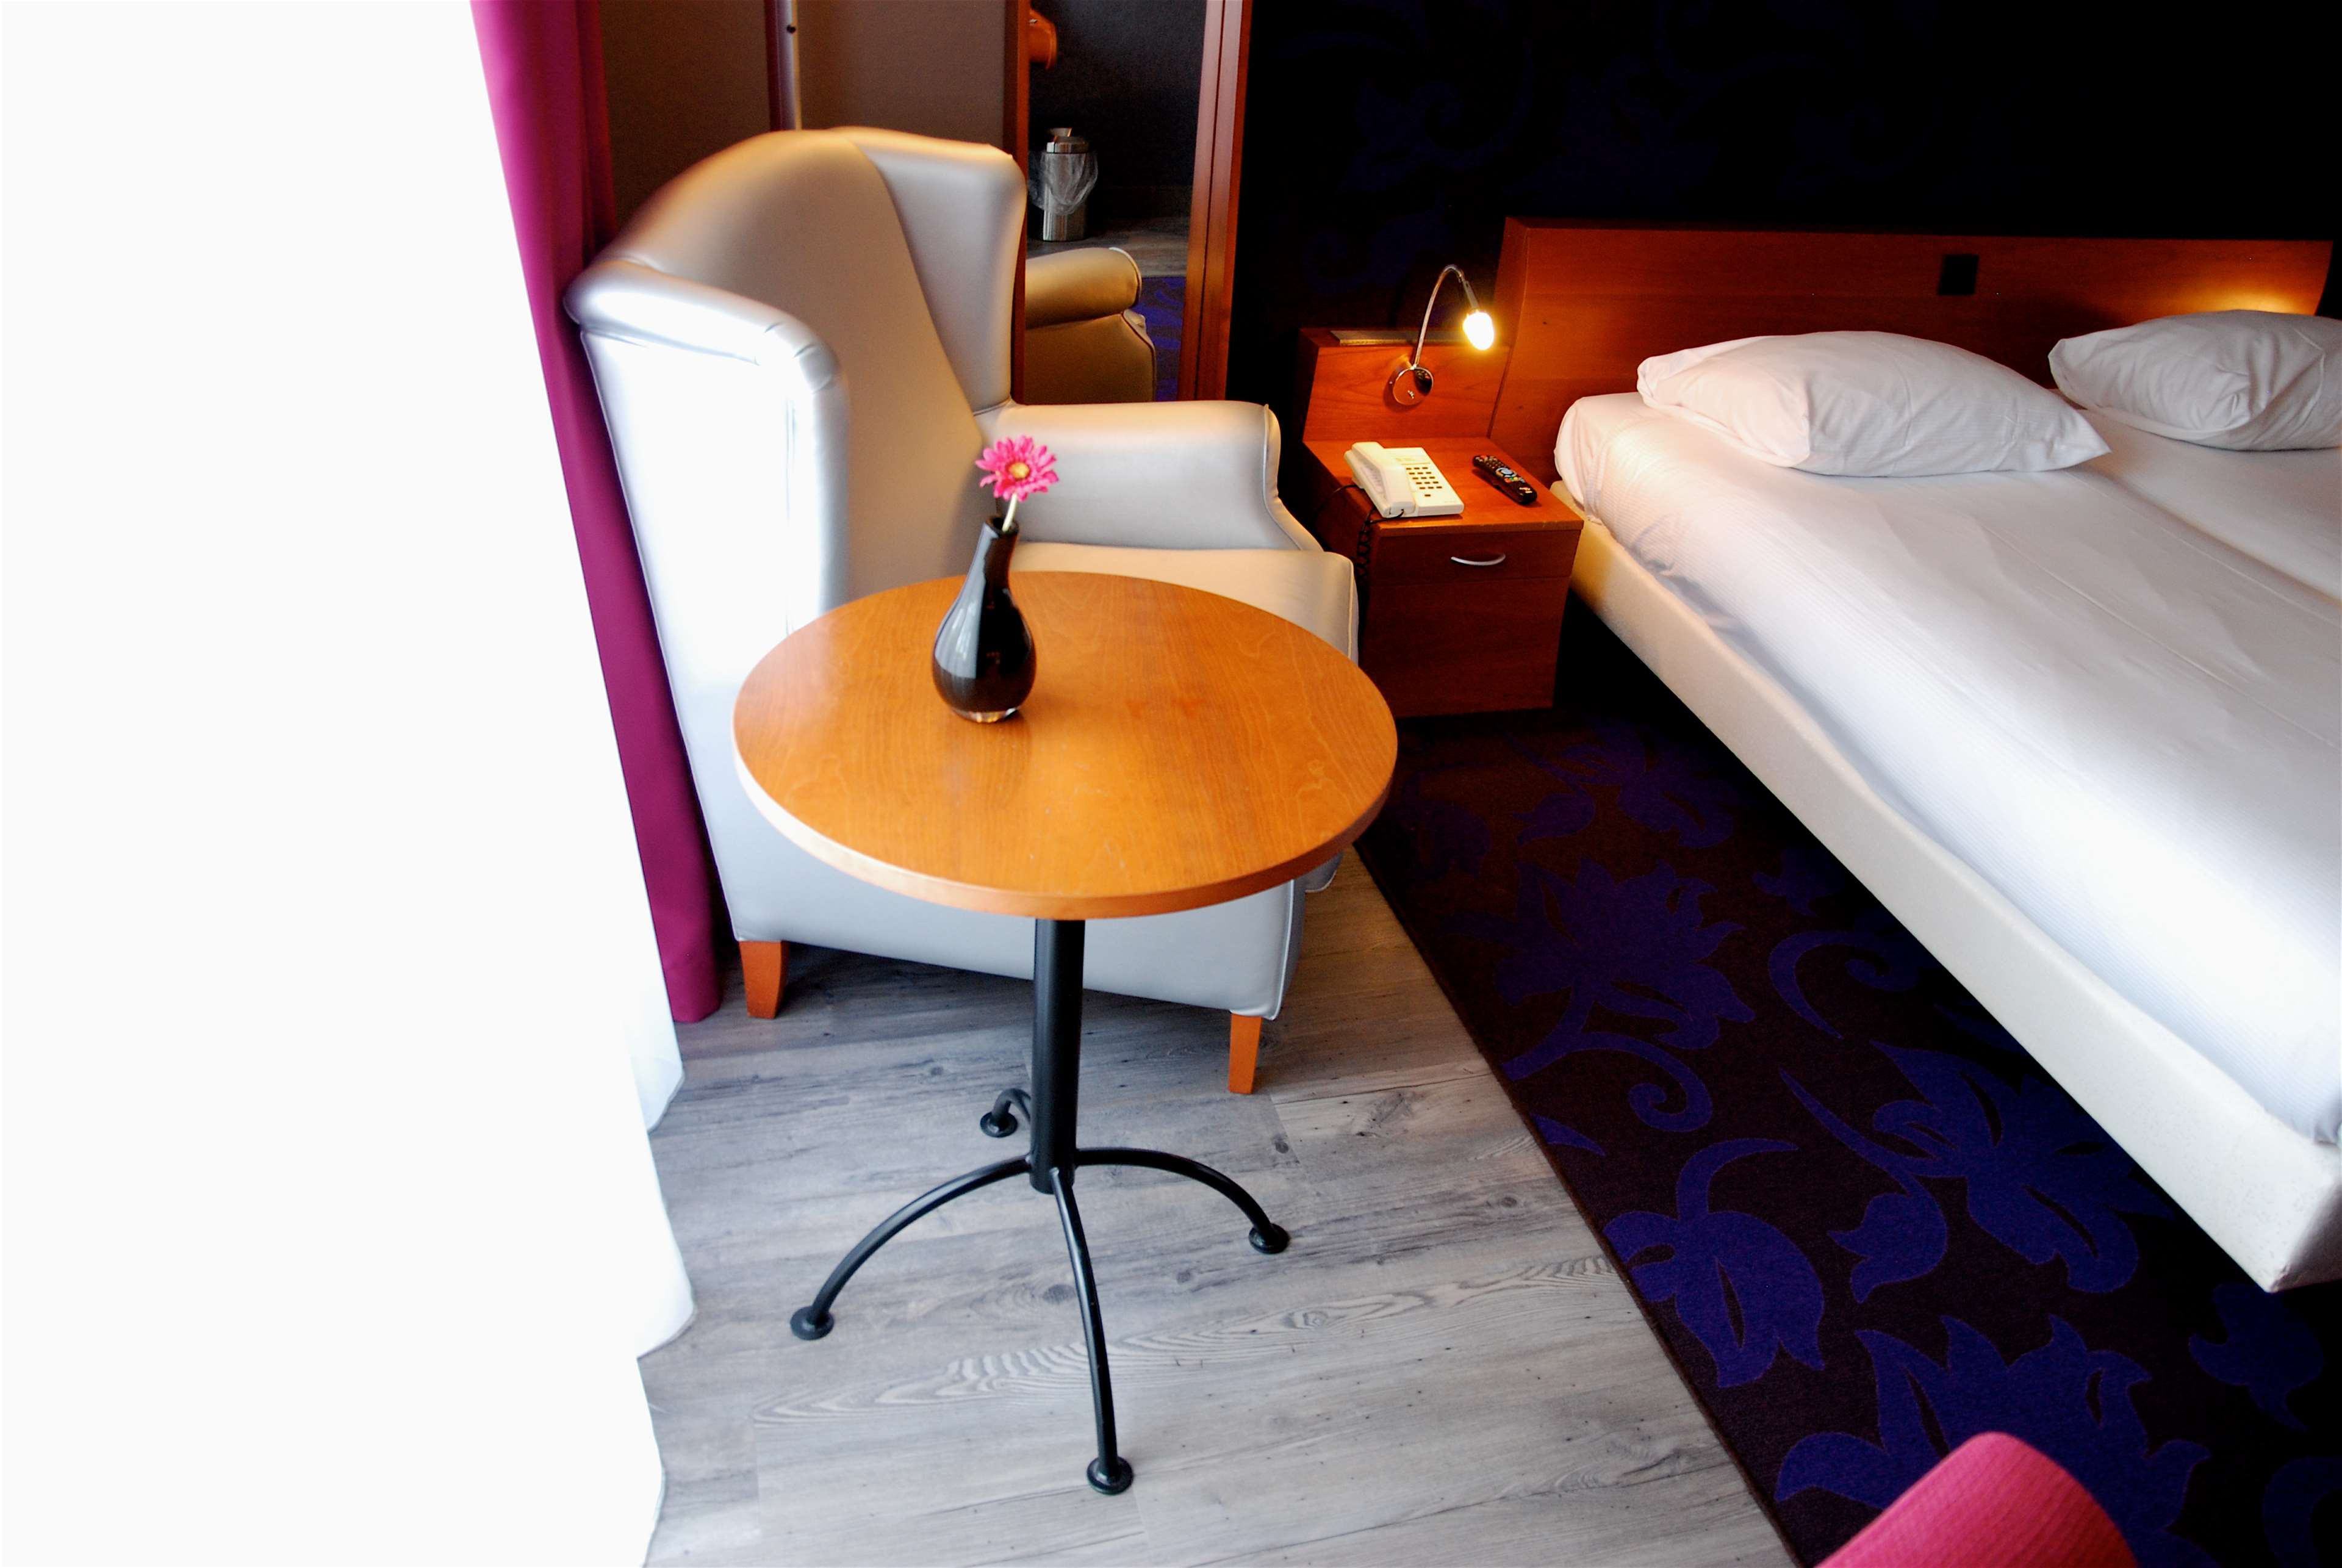 Best western plus berghotel amersfoort hotels for Berghotel design